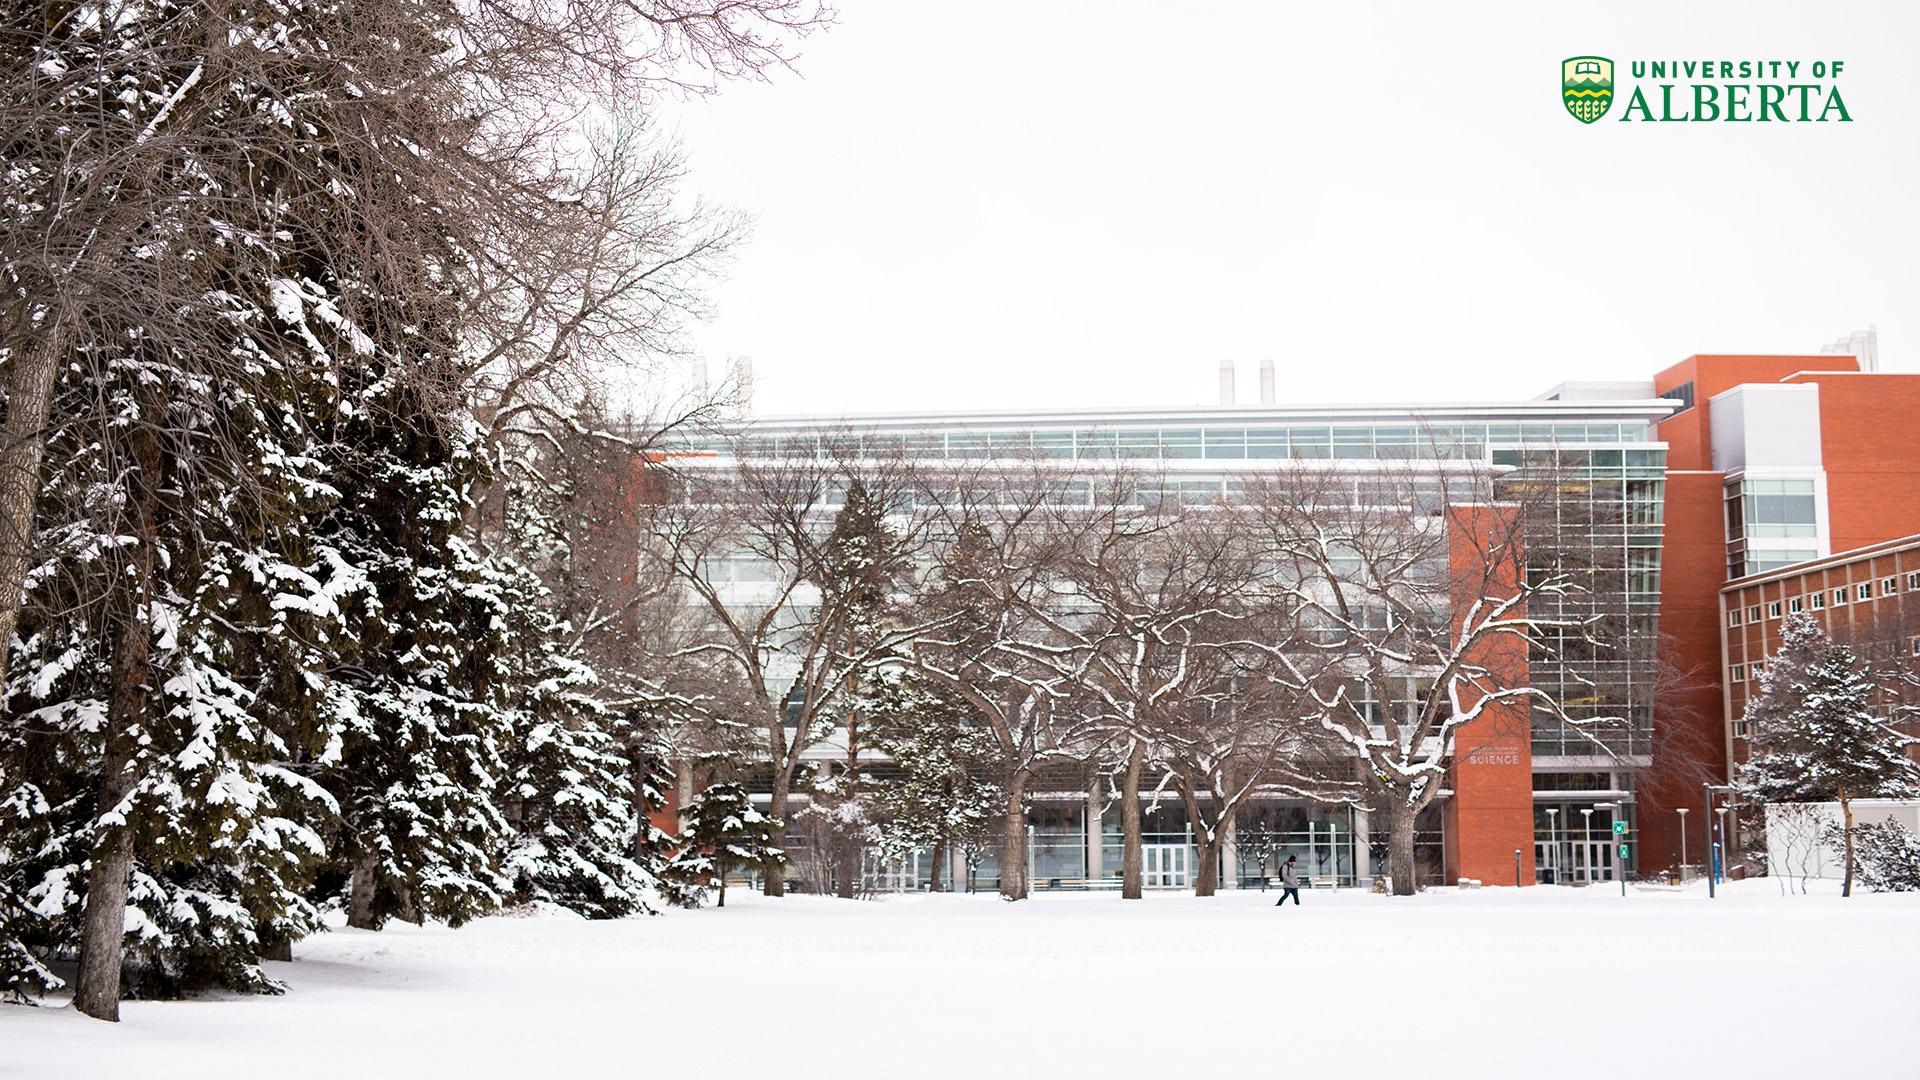 north campus